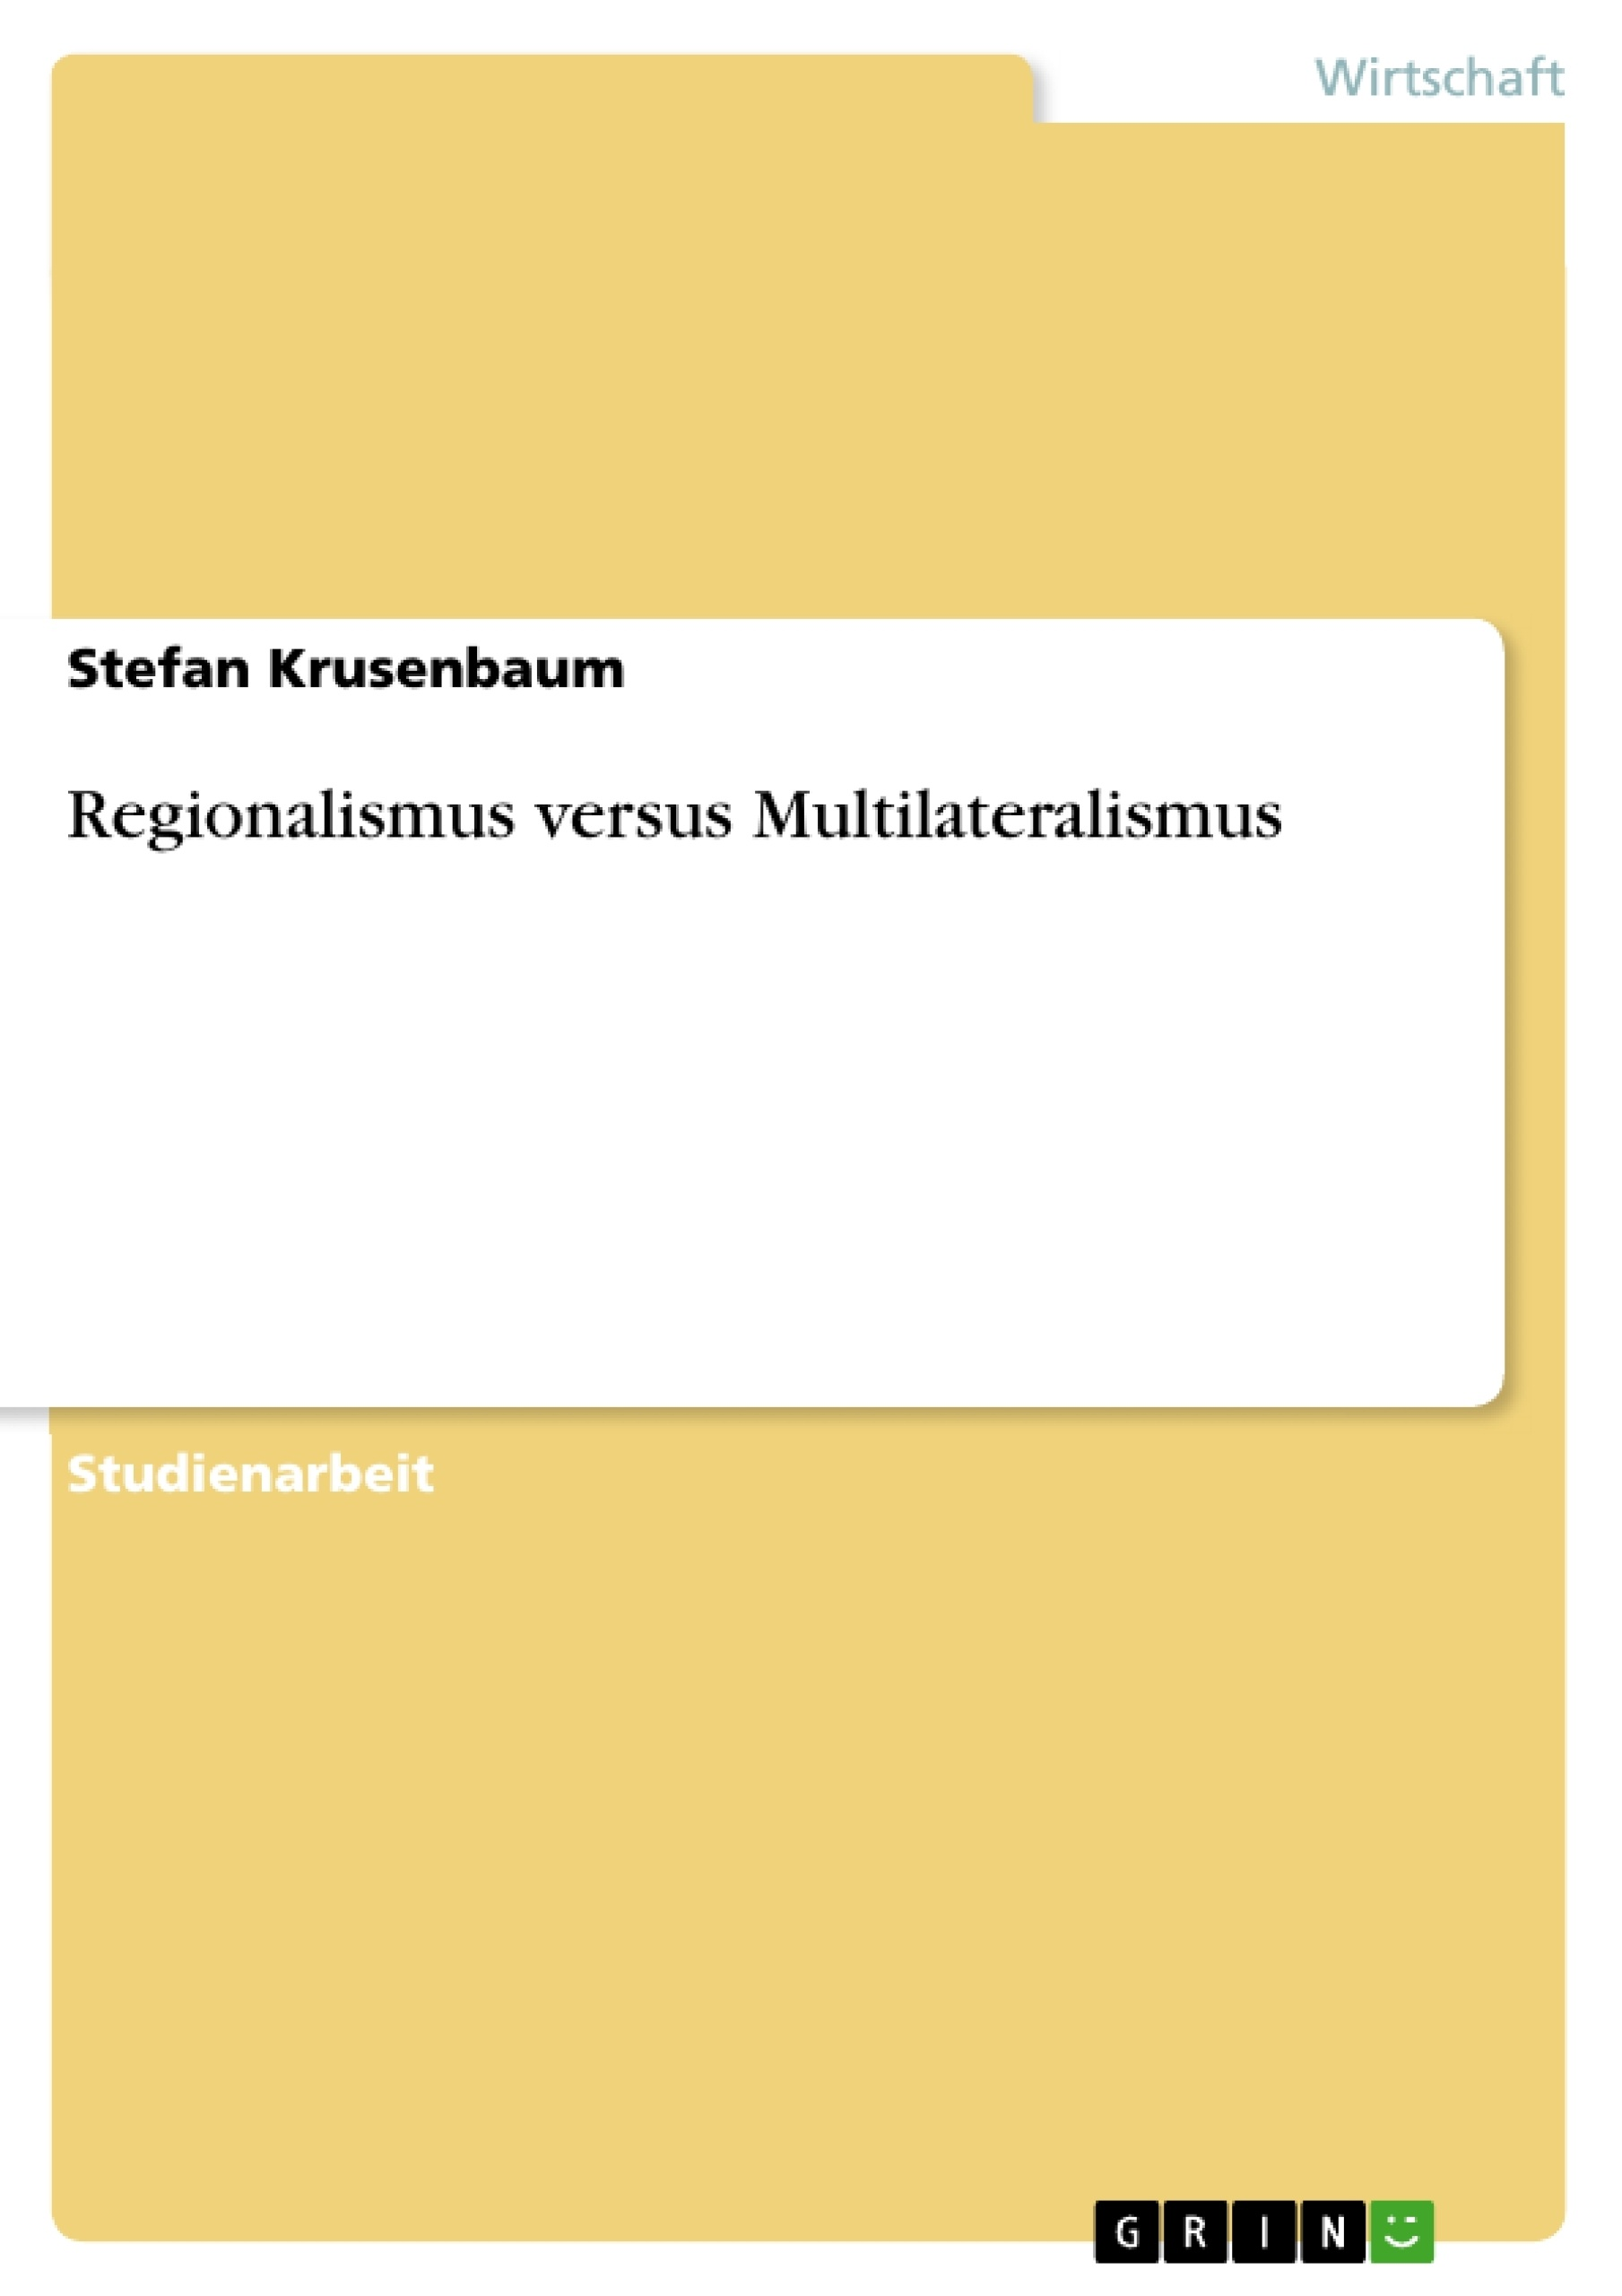 Titel: Regionalismus versus Multilateralismus